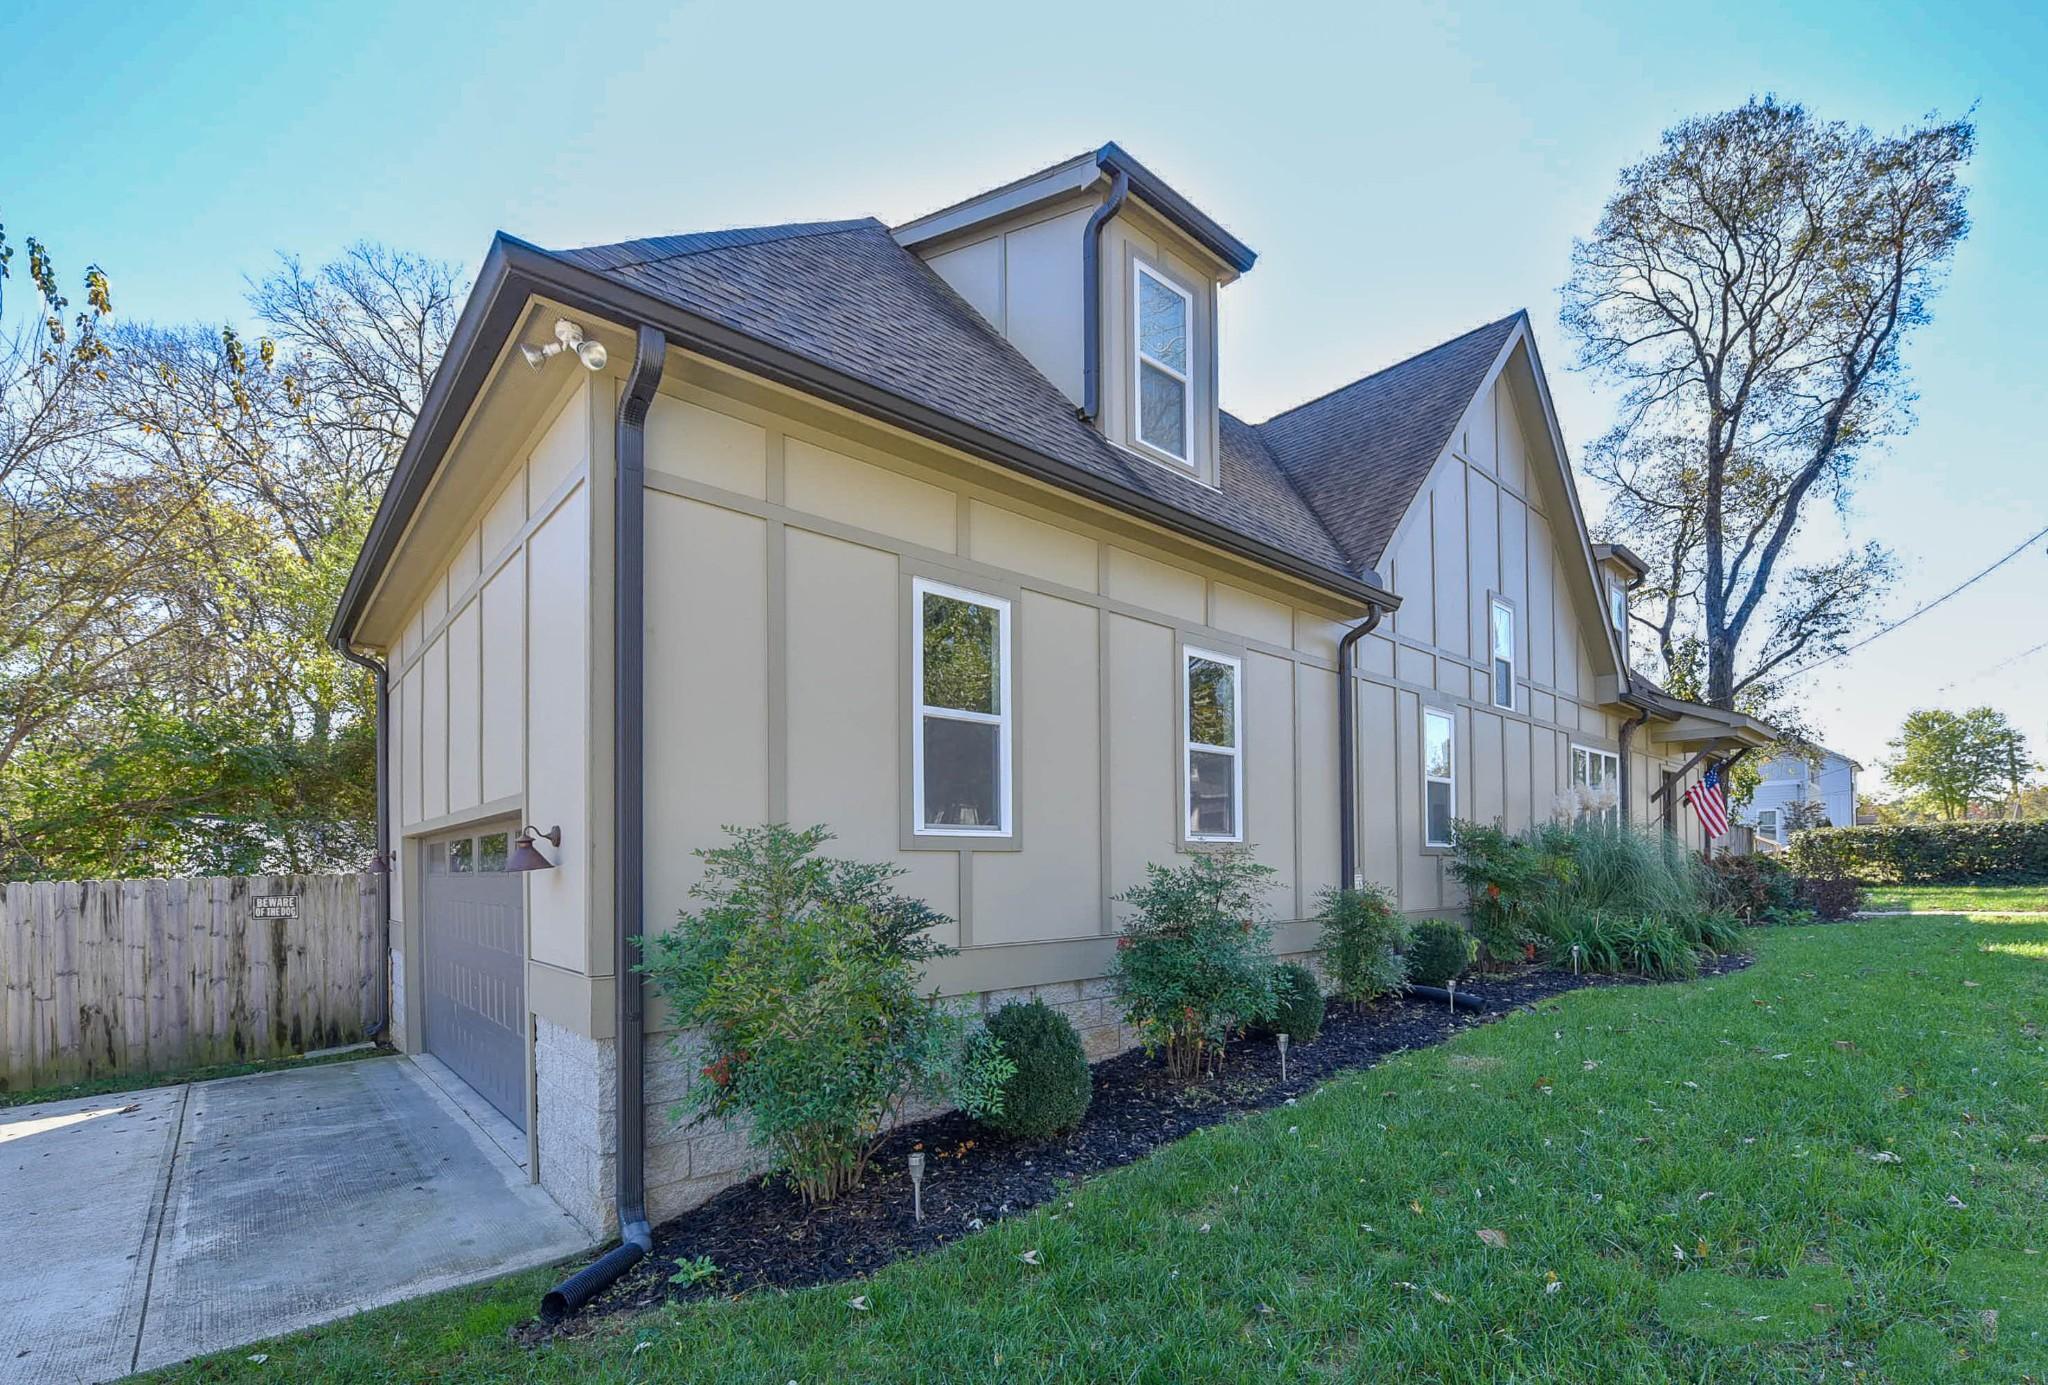 4010 Burrus St, Nashville, TN 37216 - Nashville, TN real estate listing